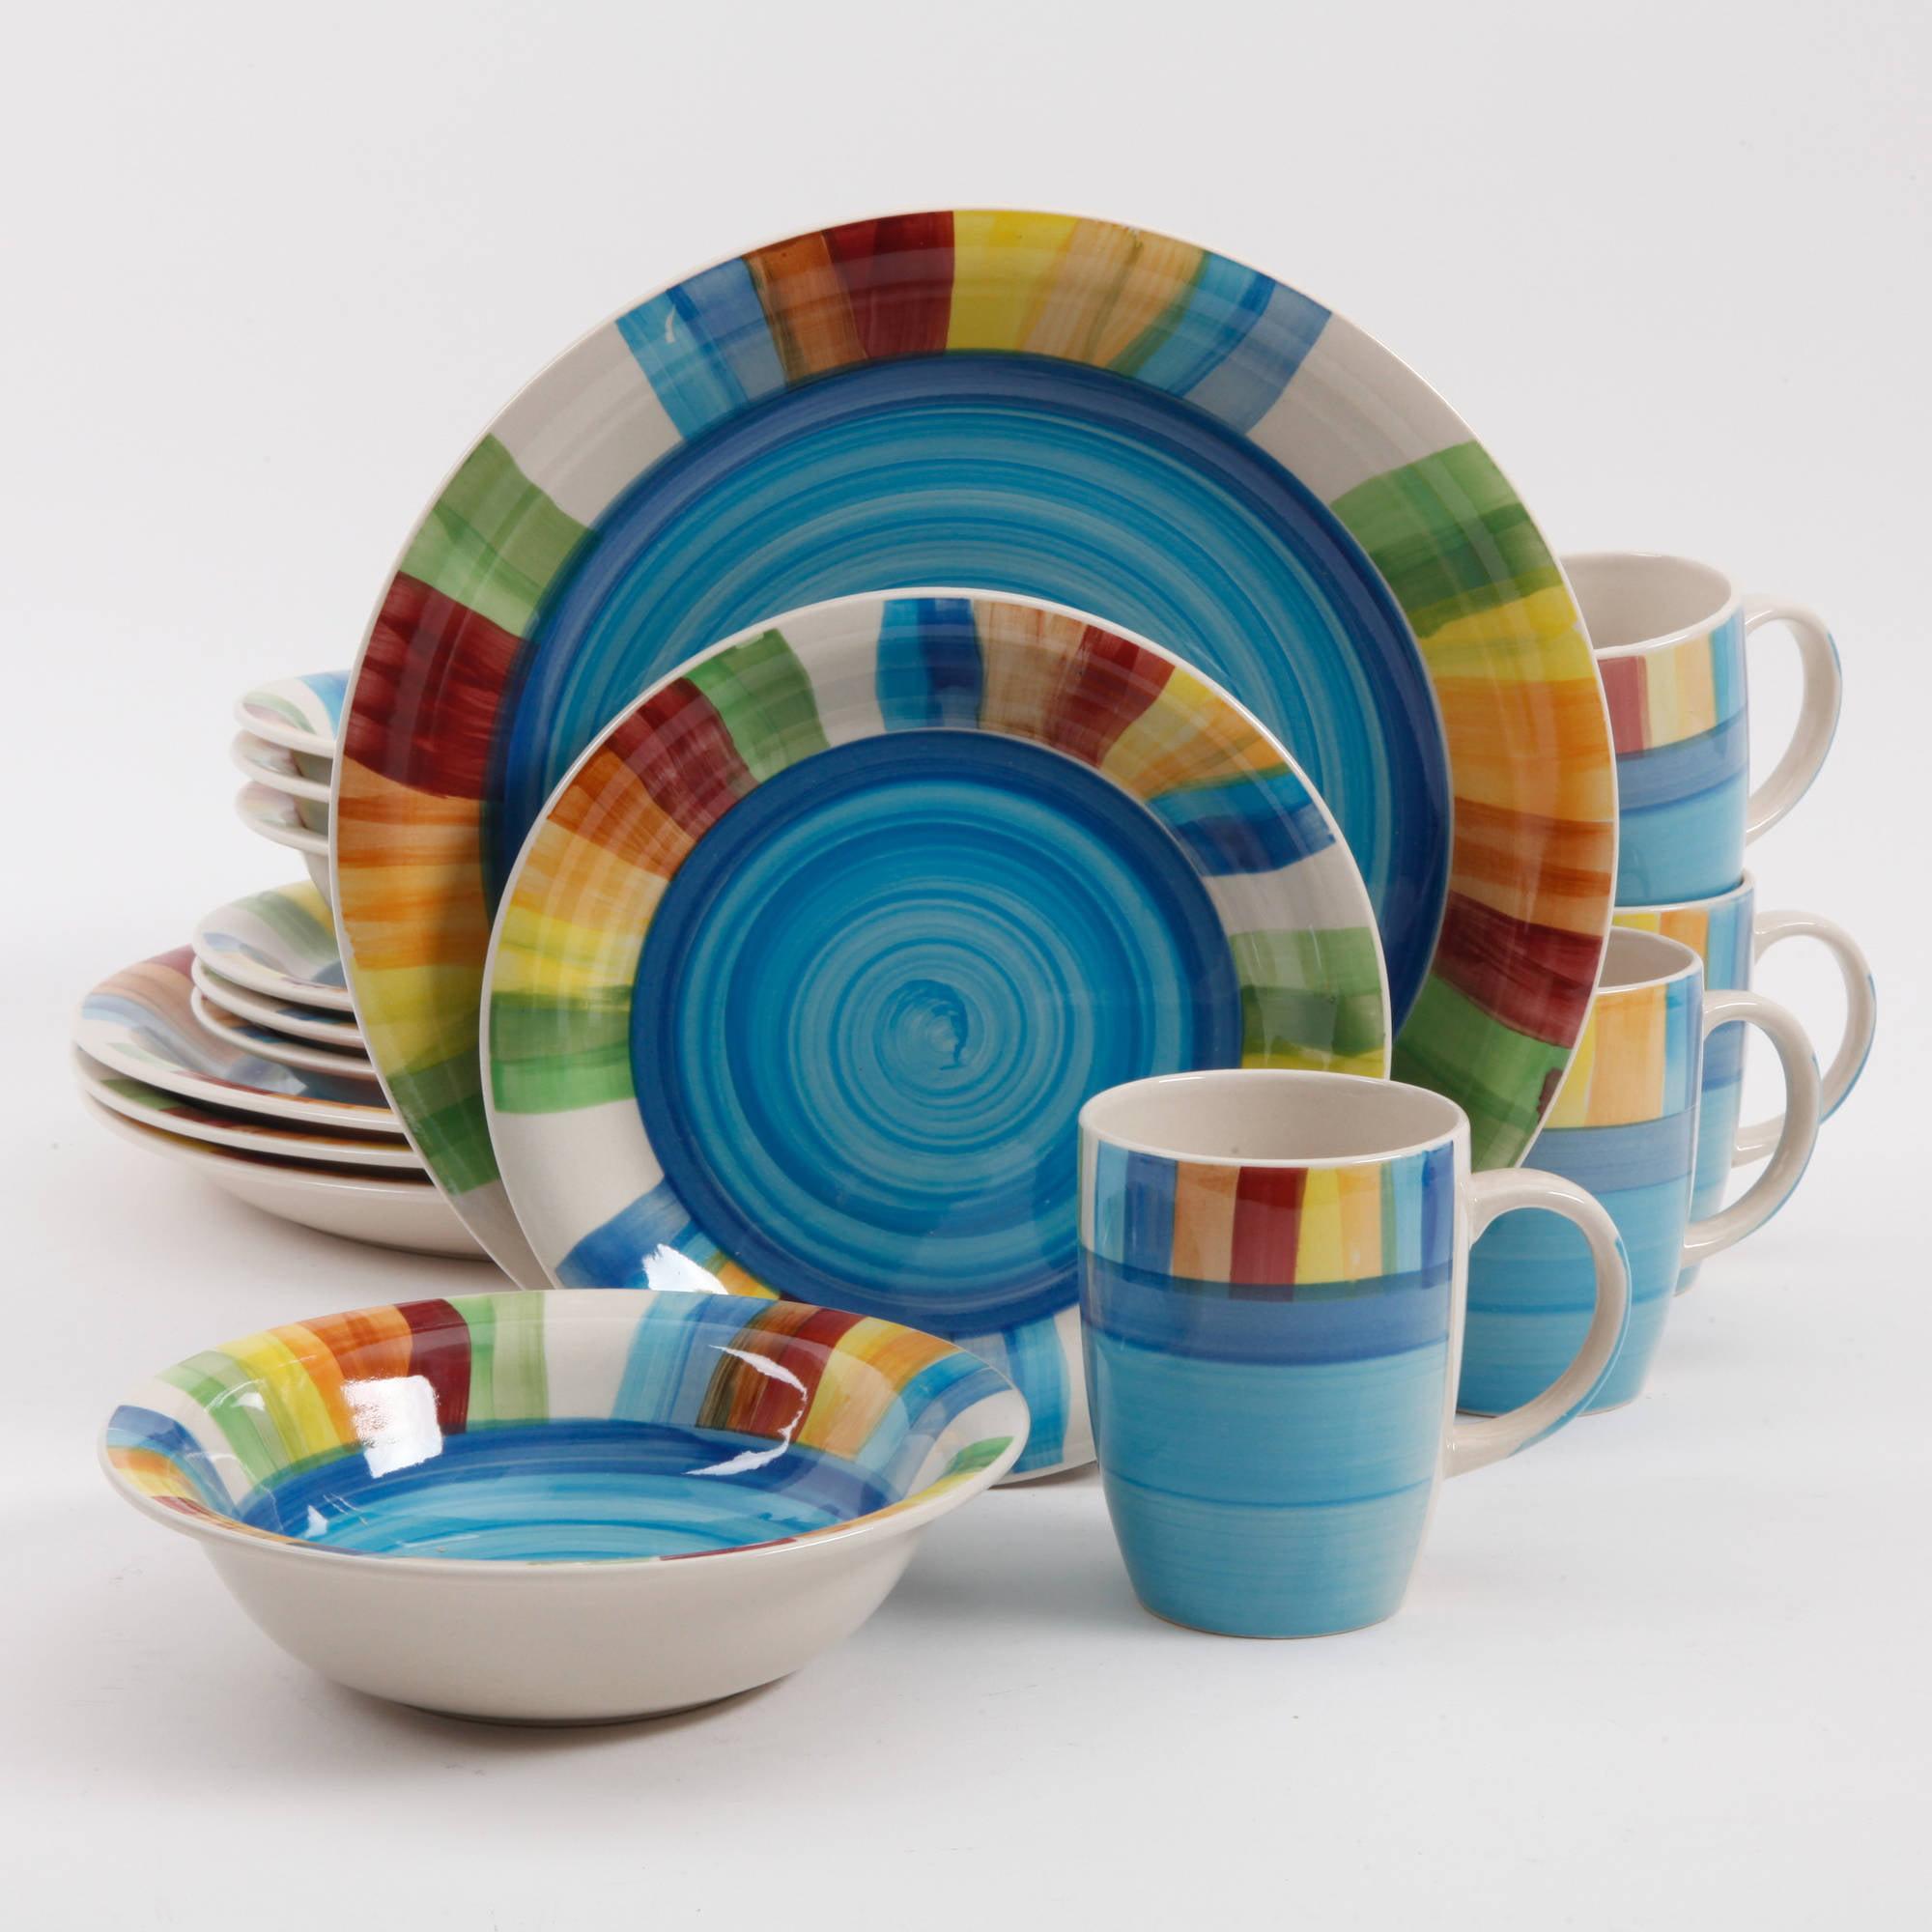 & Gibson Carmelita Stripes 16-Piece Dinnerware Set - Walmart.com